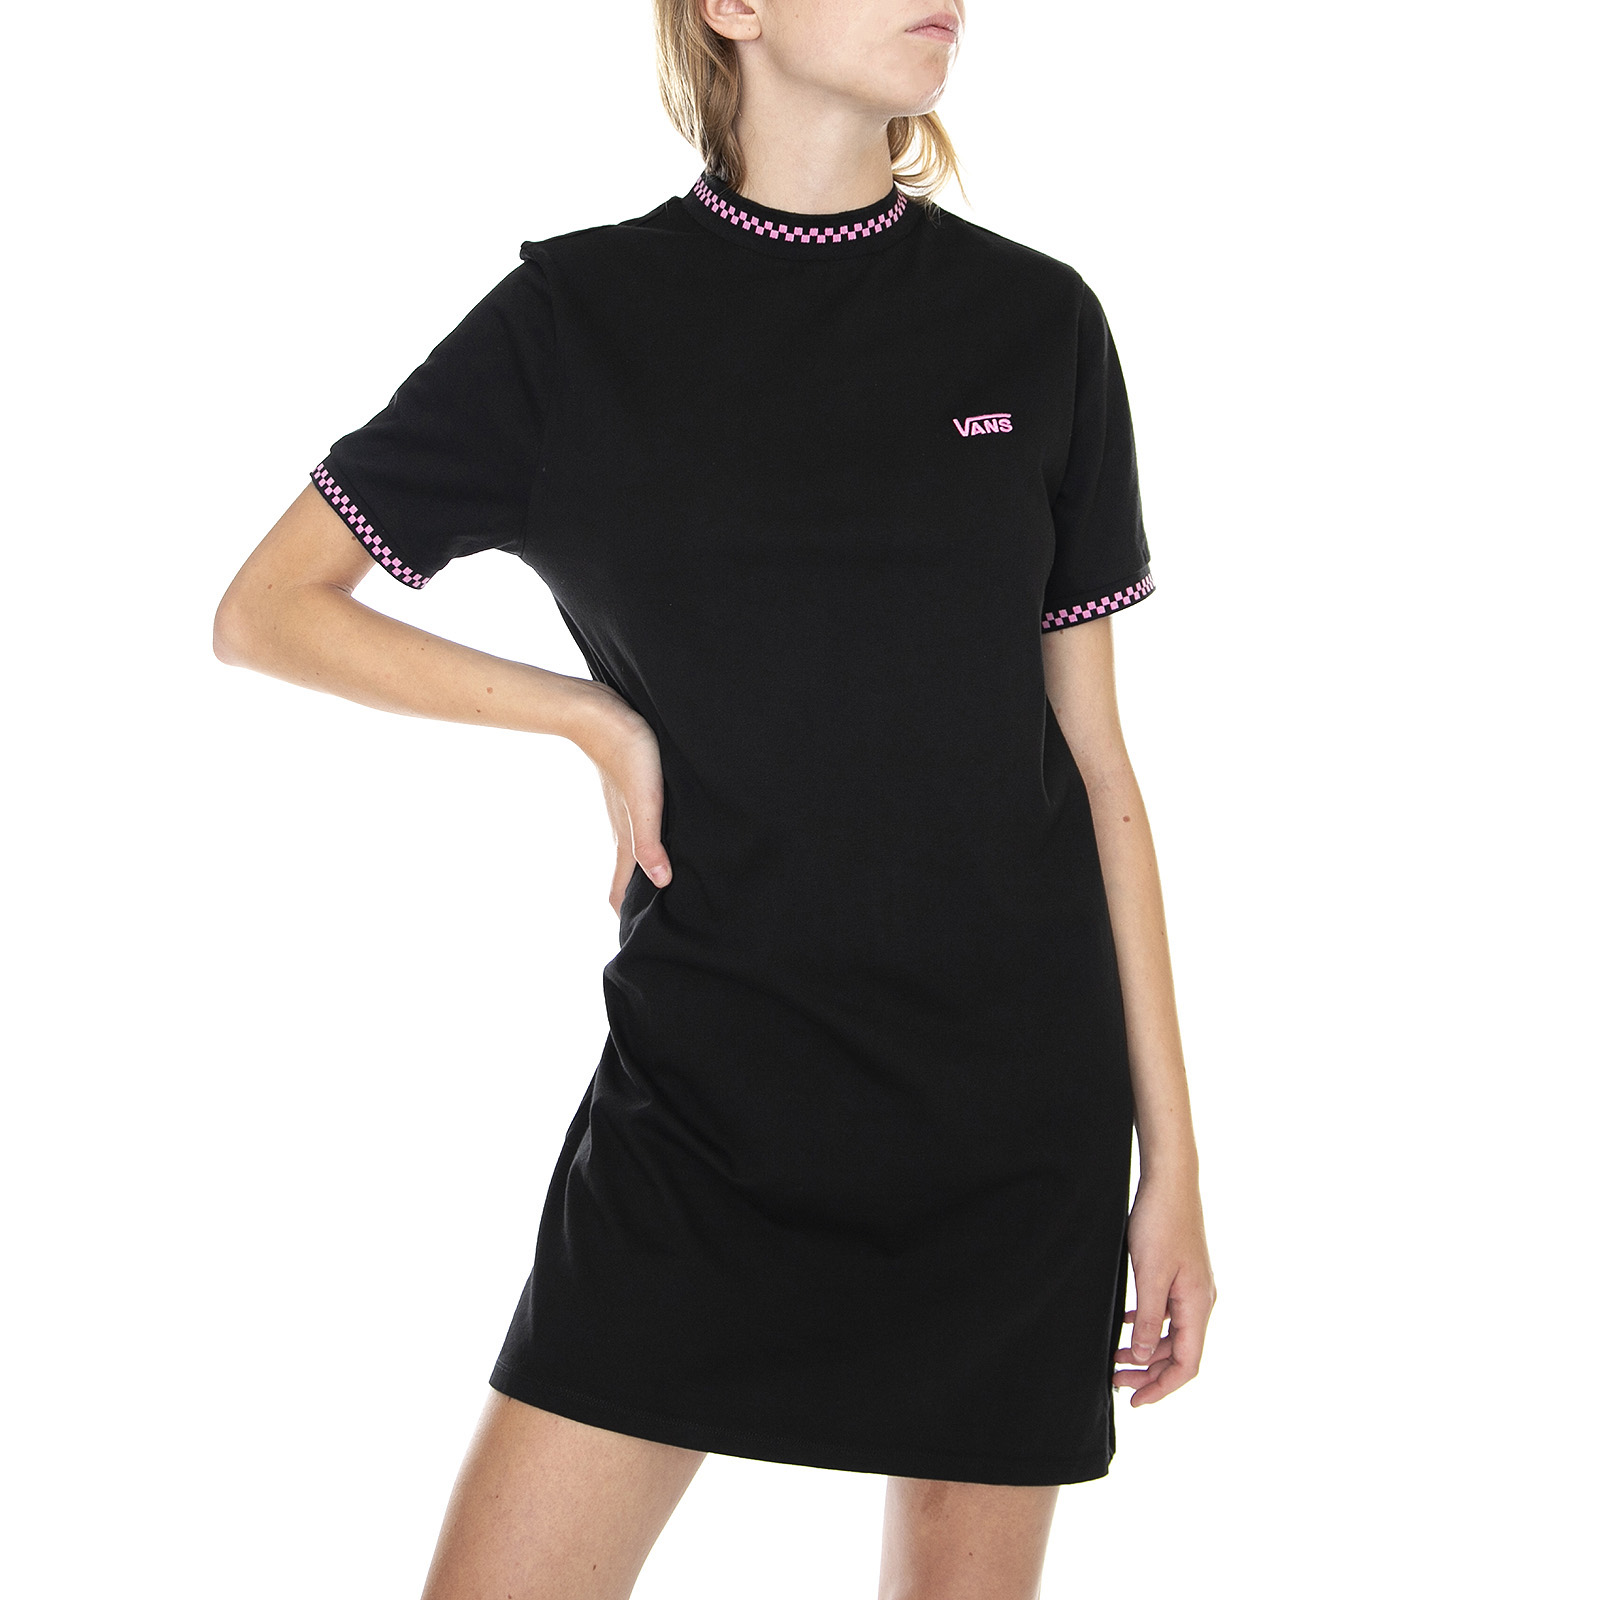 Vans all stakes dress - black - abito donna nero   eBay